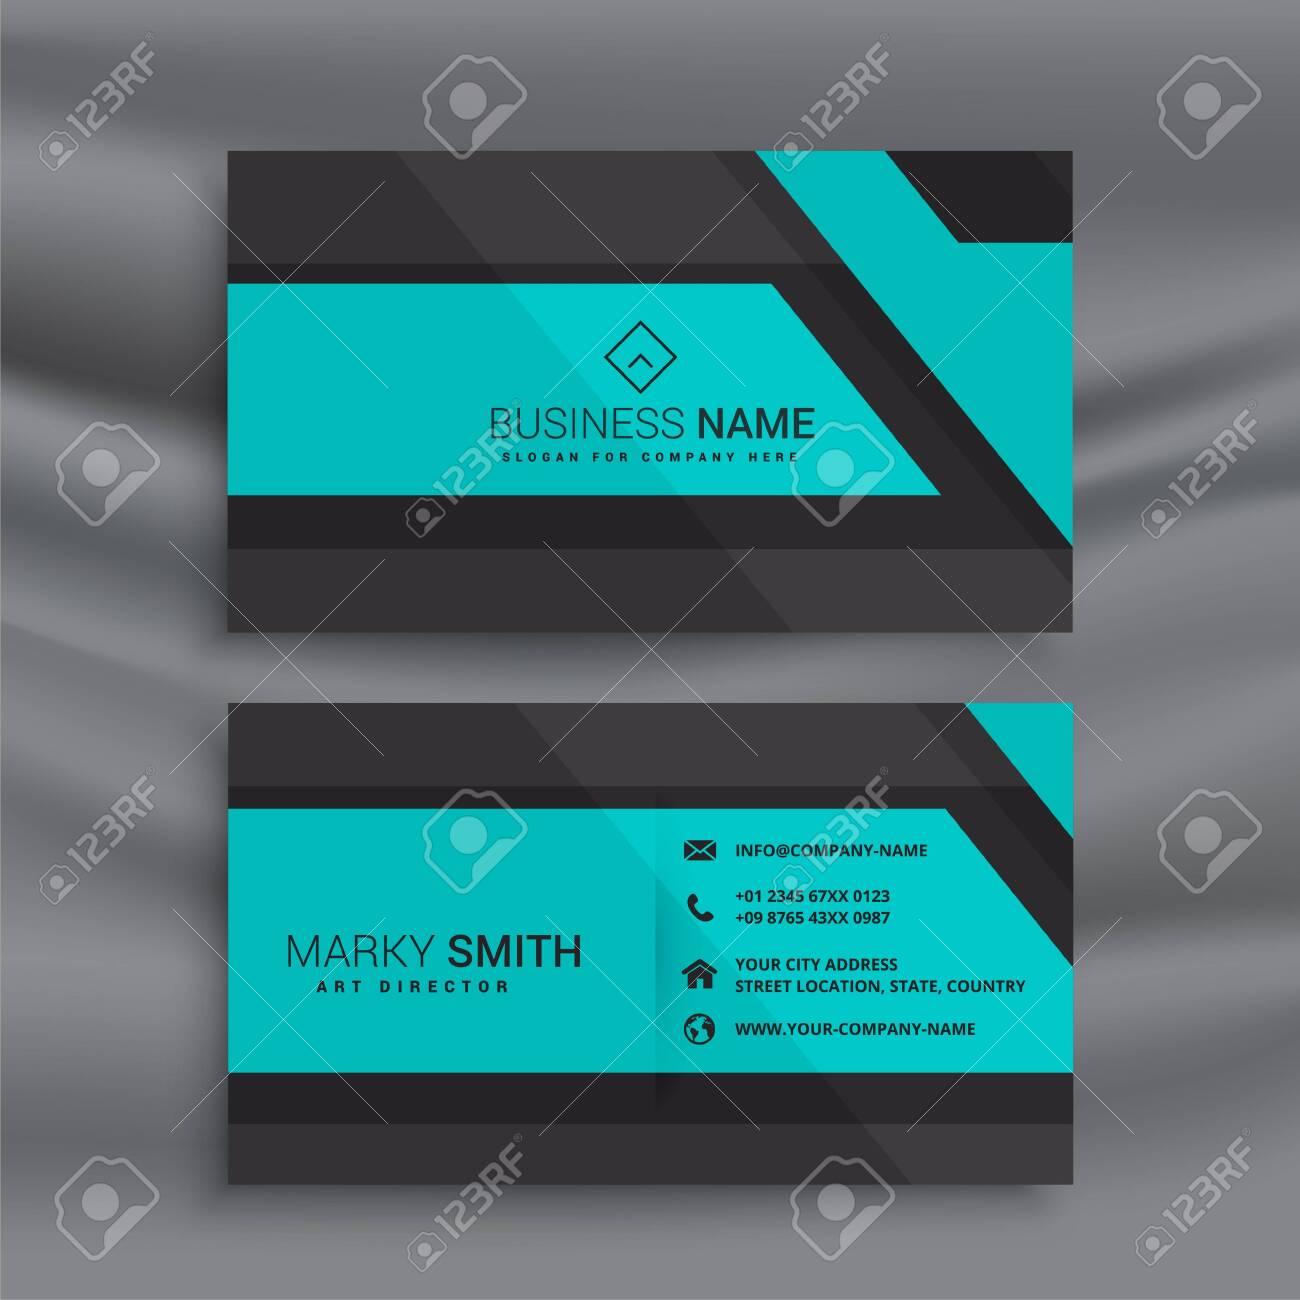 stylish blue business card design - 149023026